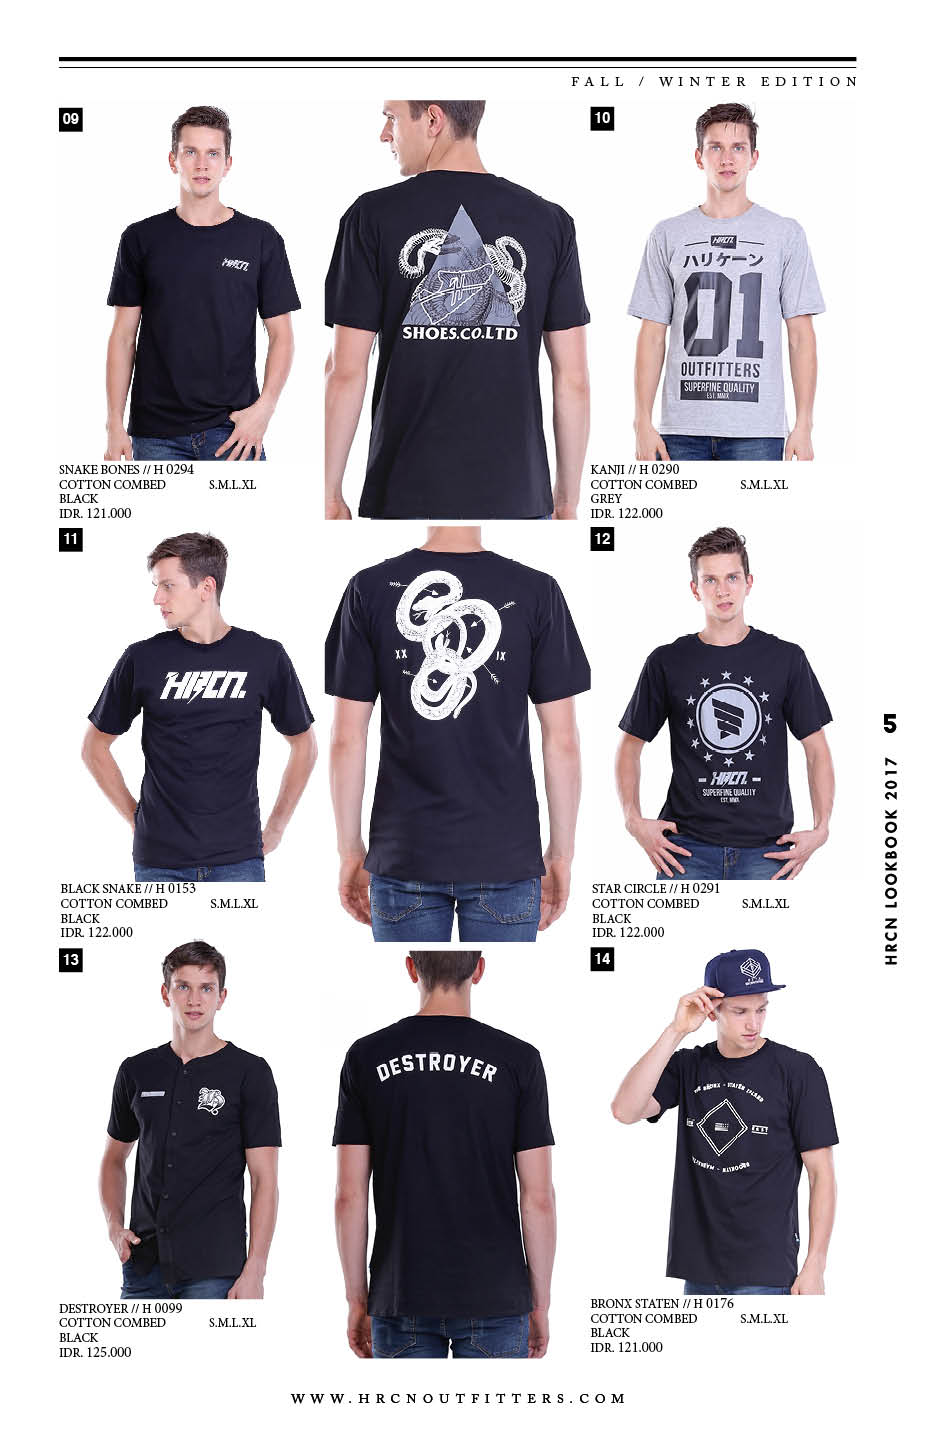 Katalog Hrcn 2017 2018 Fashion Distro Anak Muda Jaman Now H 1021 Black Kurta R Kos